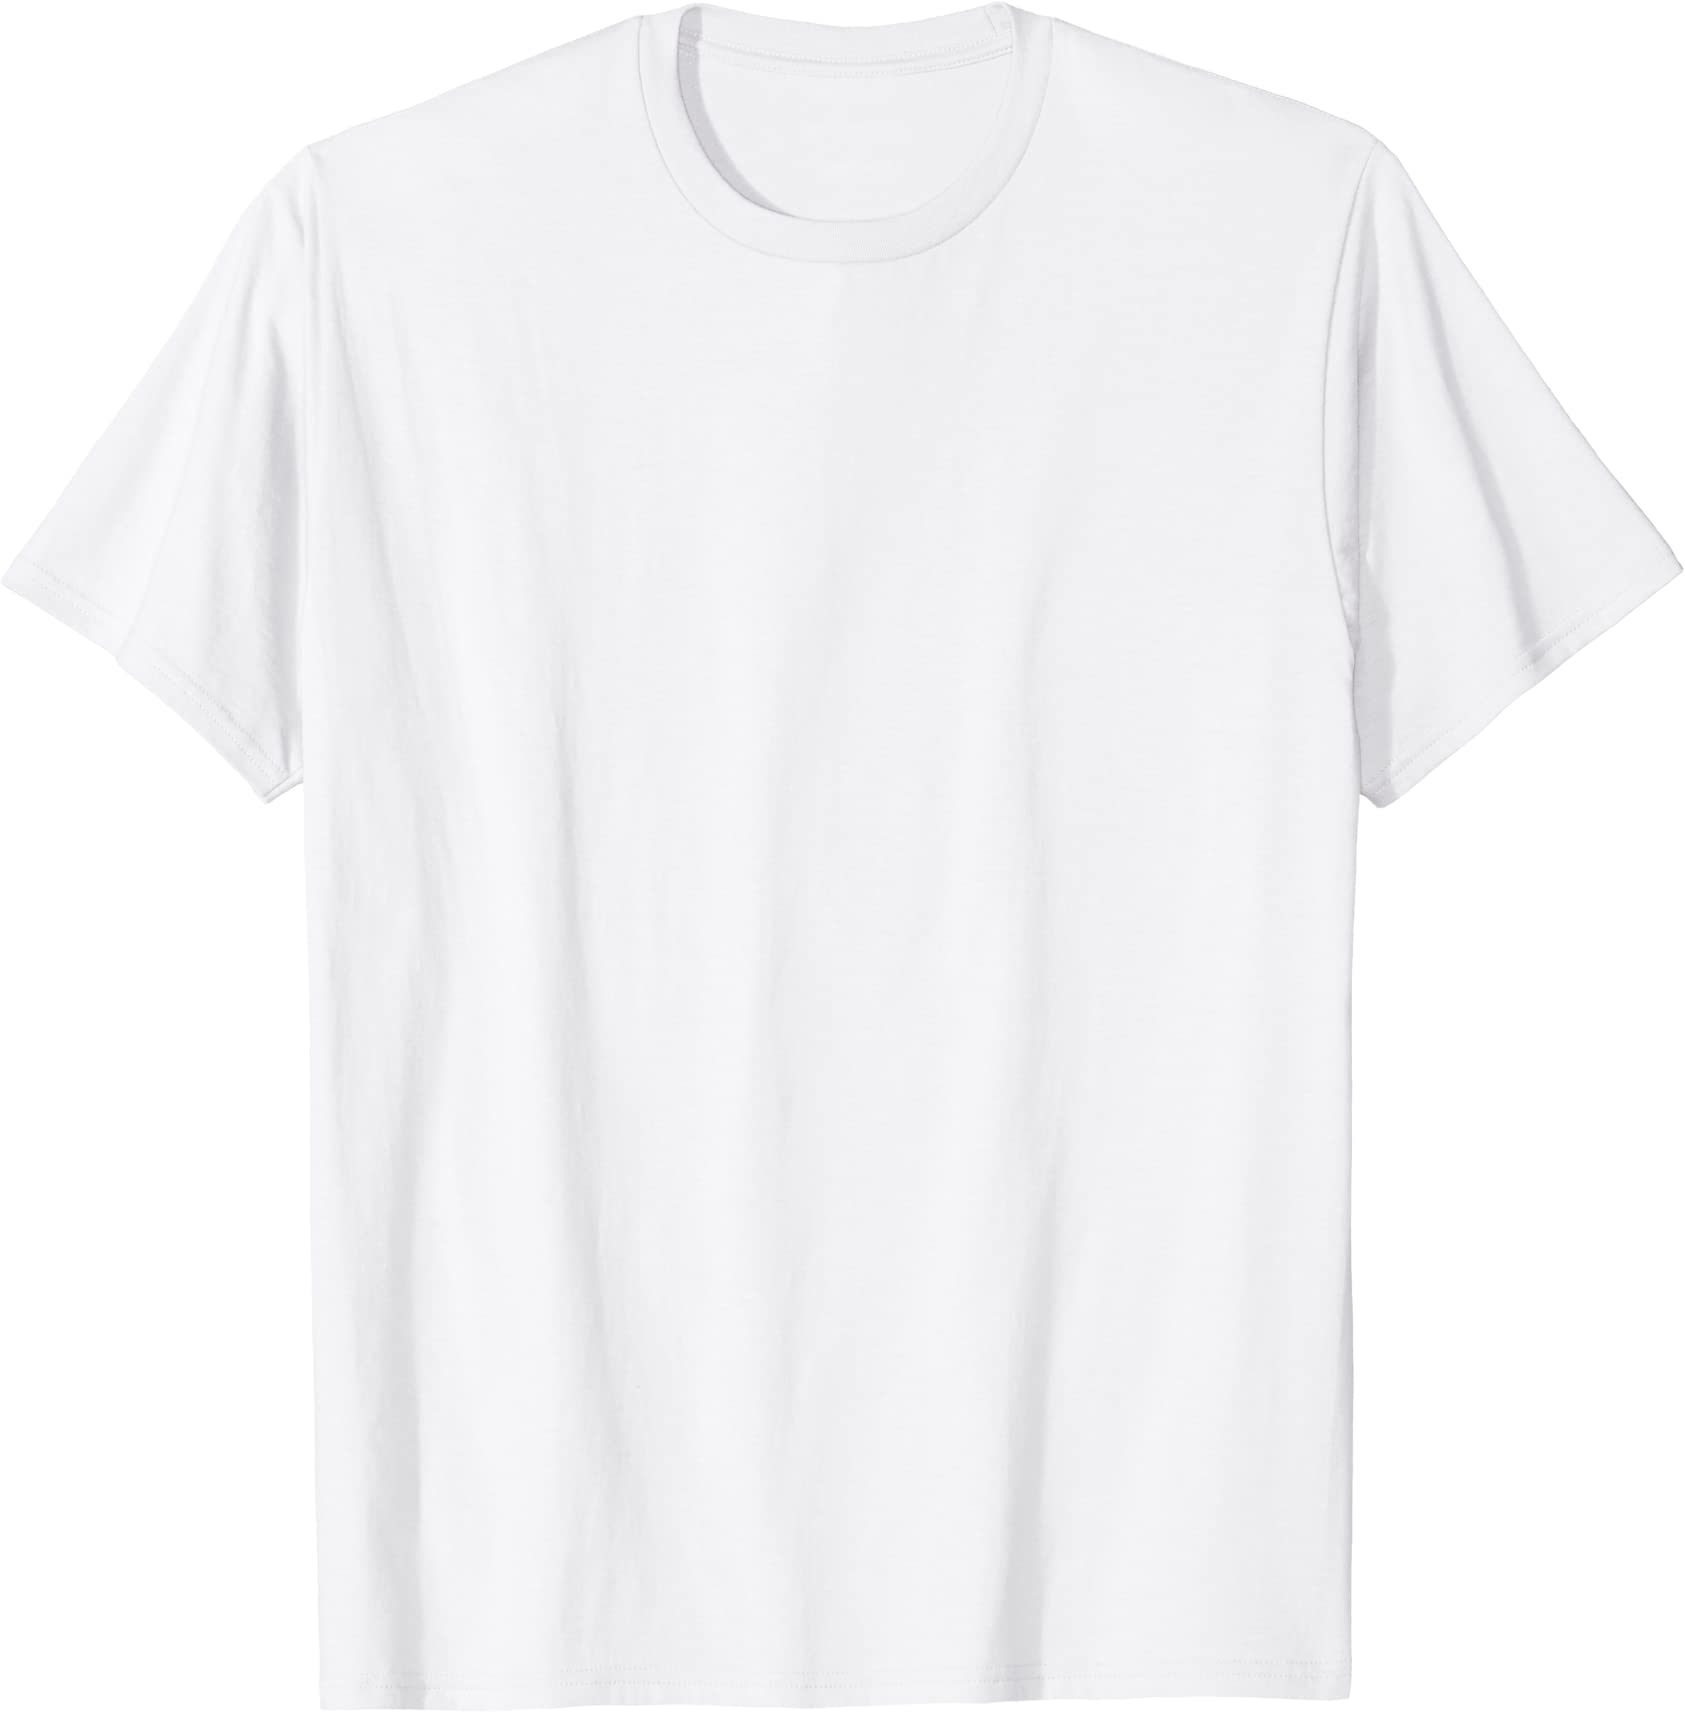 Infinite Love Design Choose Kind Tshirt Shirt Tee